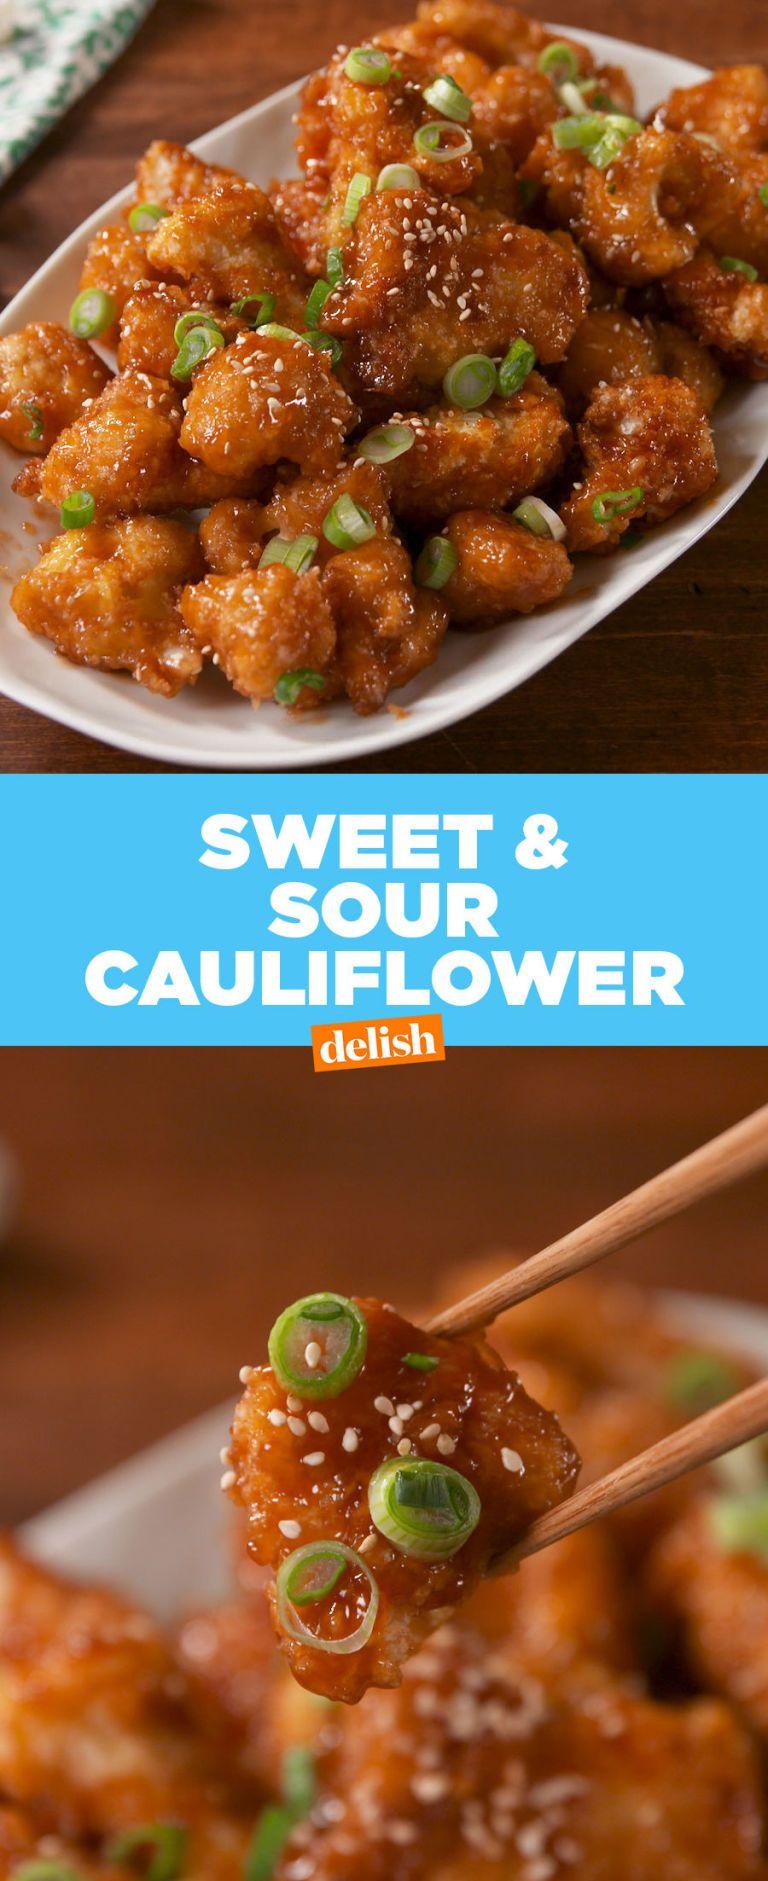 Photo of Sweet & Sour Cauliflower